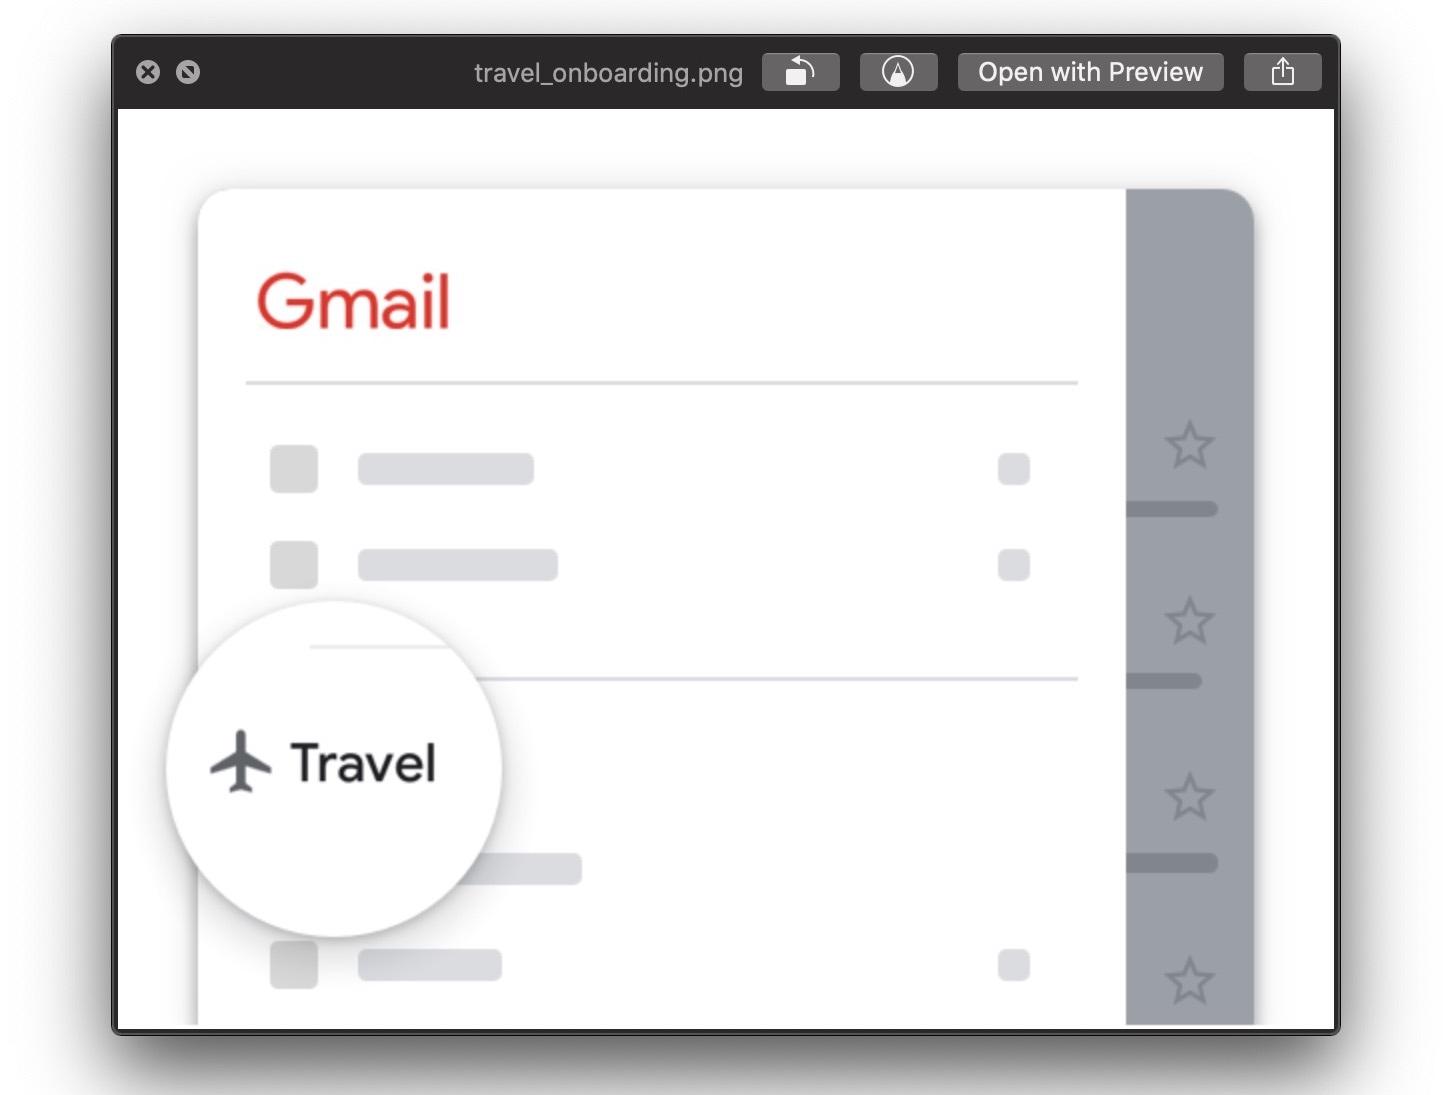 gmail-2020-02-02-travel-label